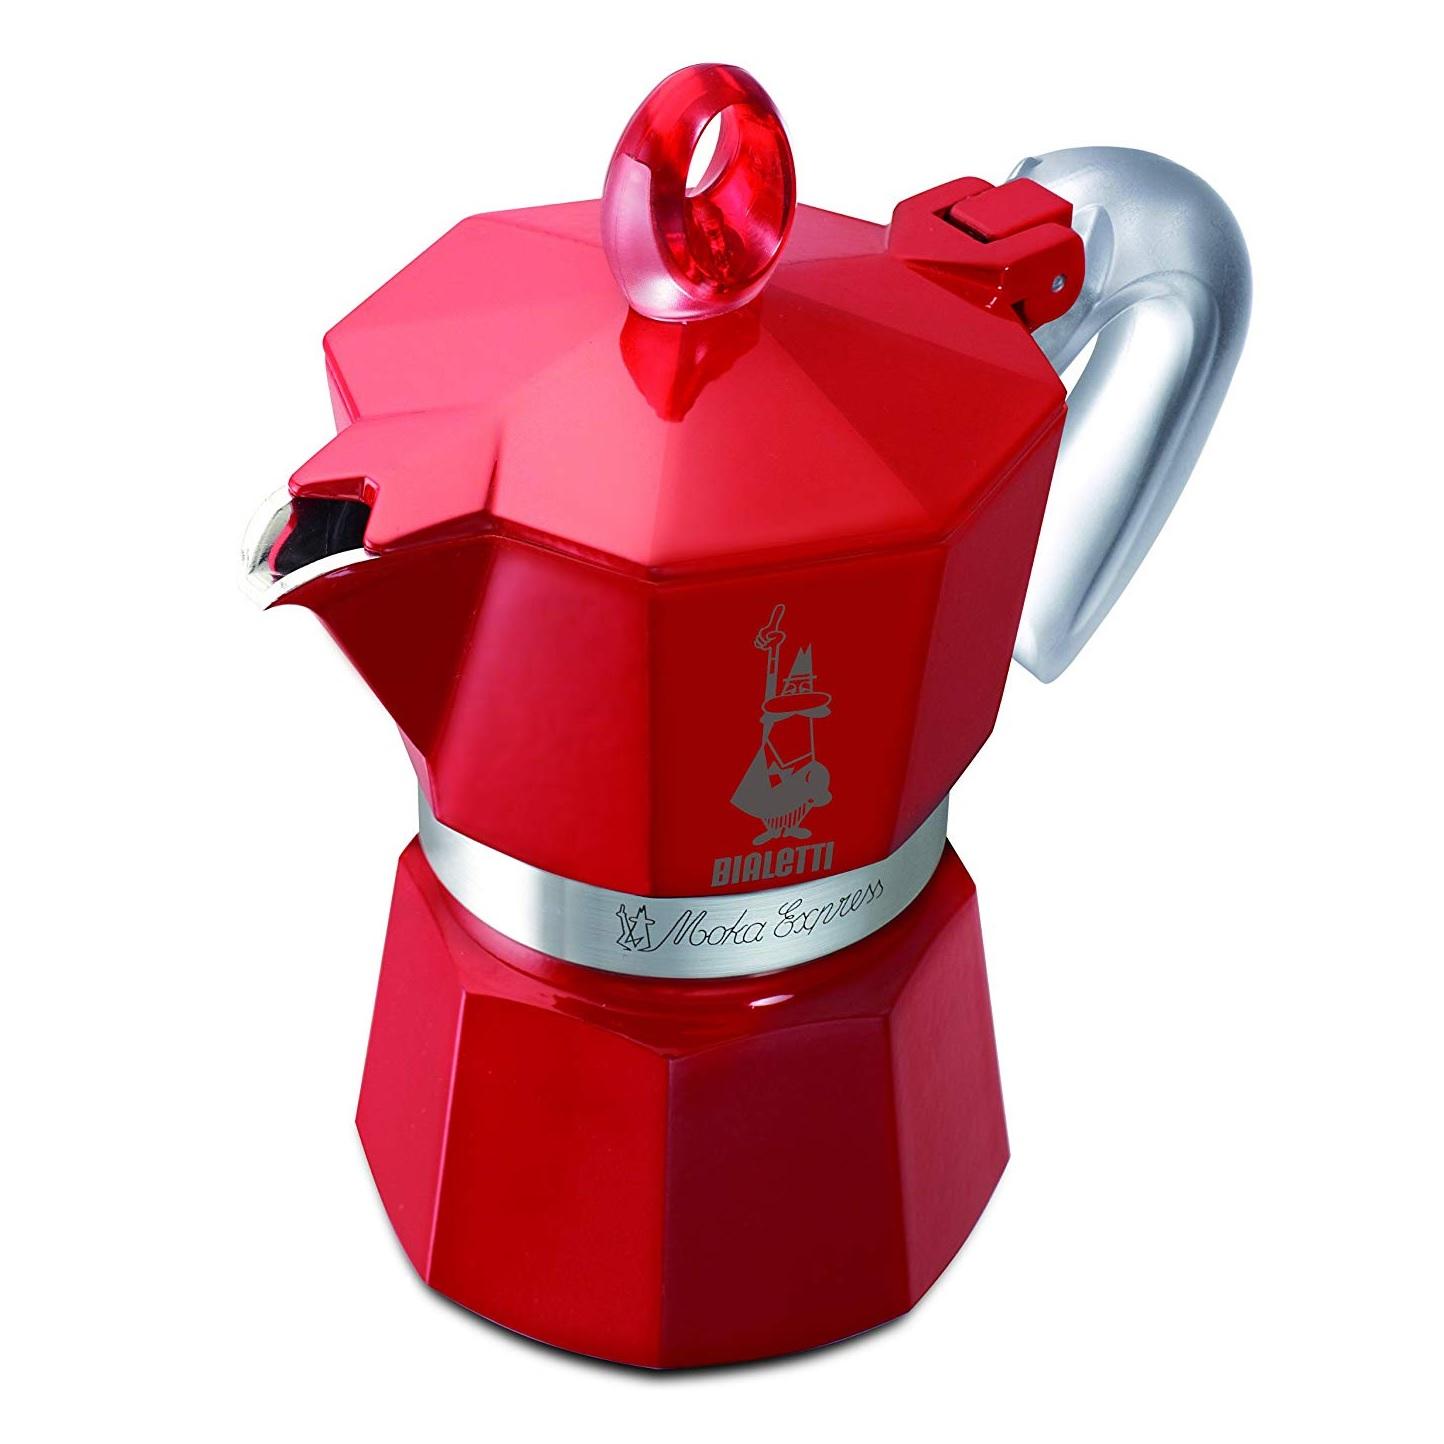 قهوه جوش بیالتی مدل موکا اکسپرس جی ال کد 3